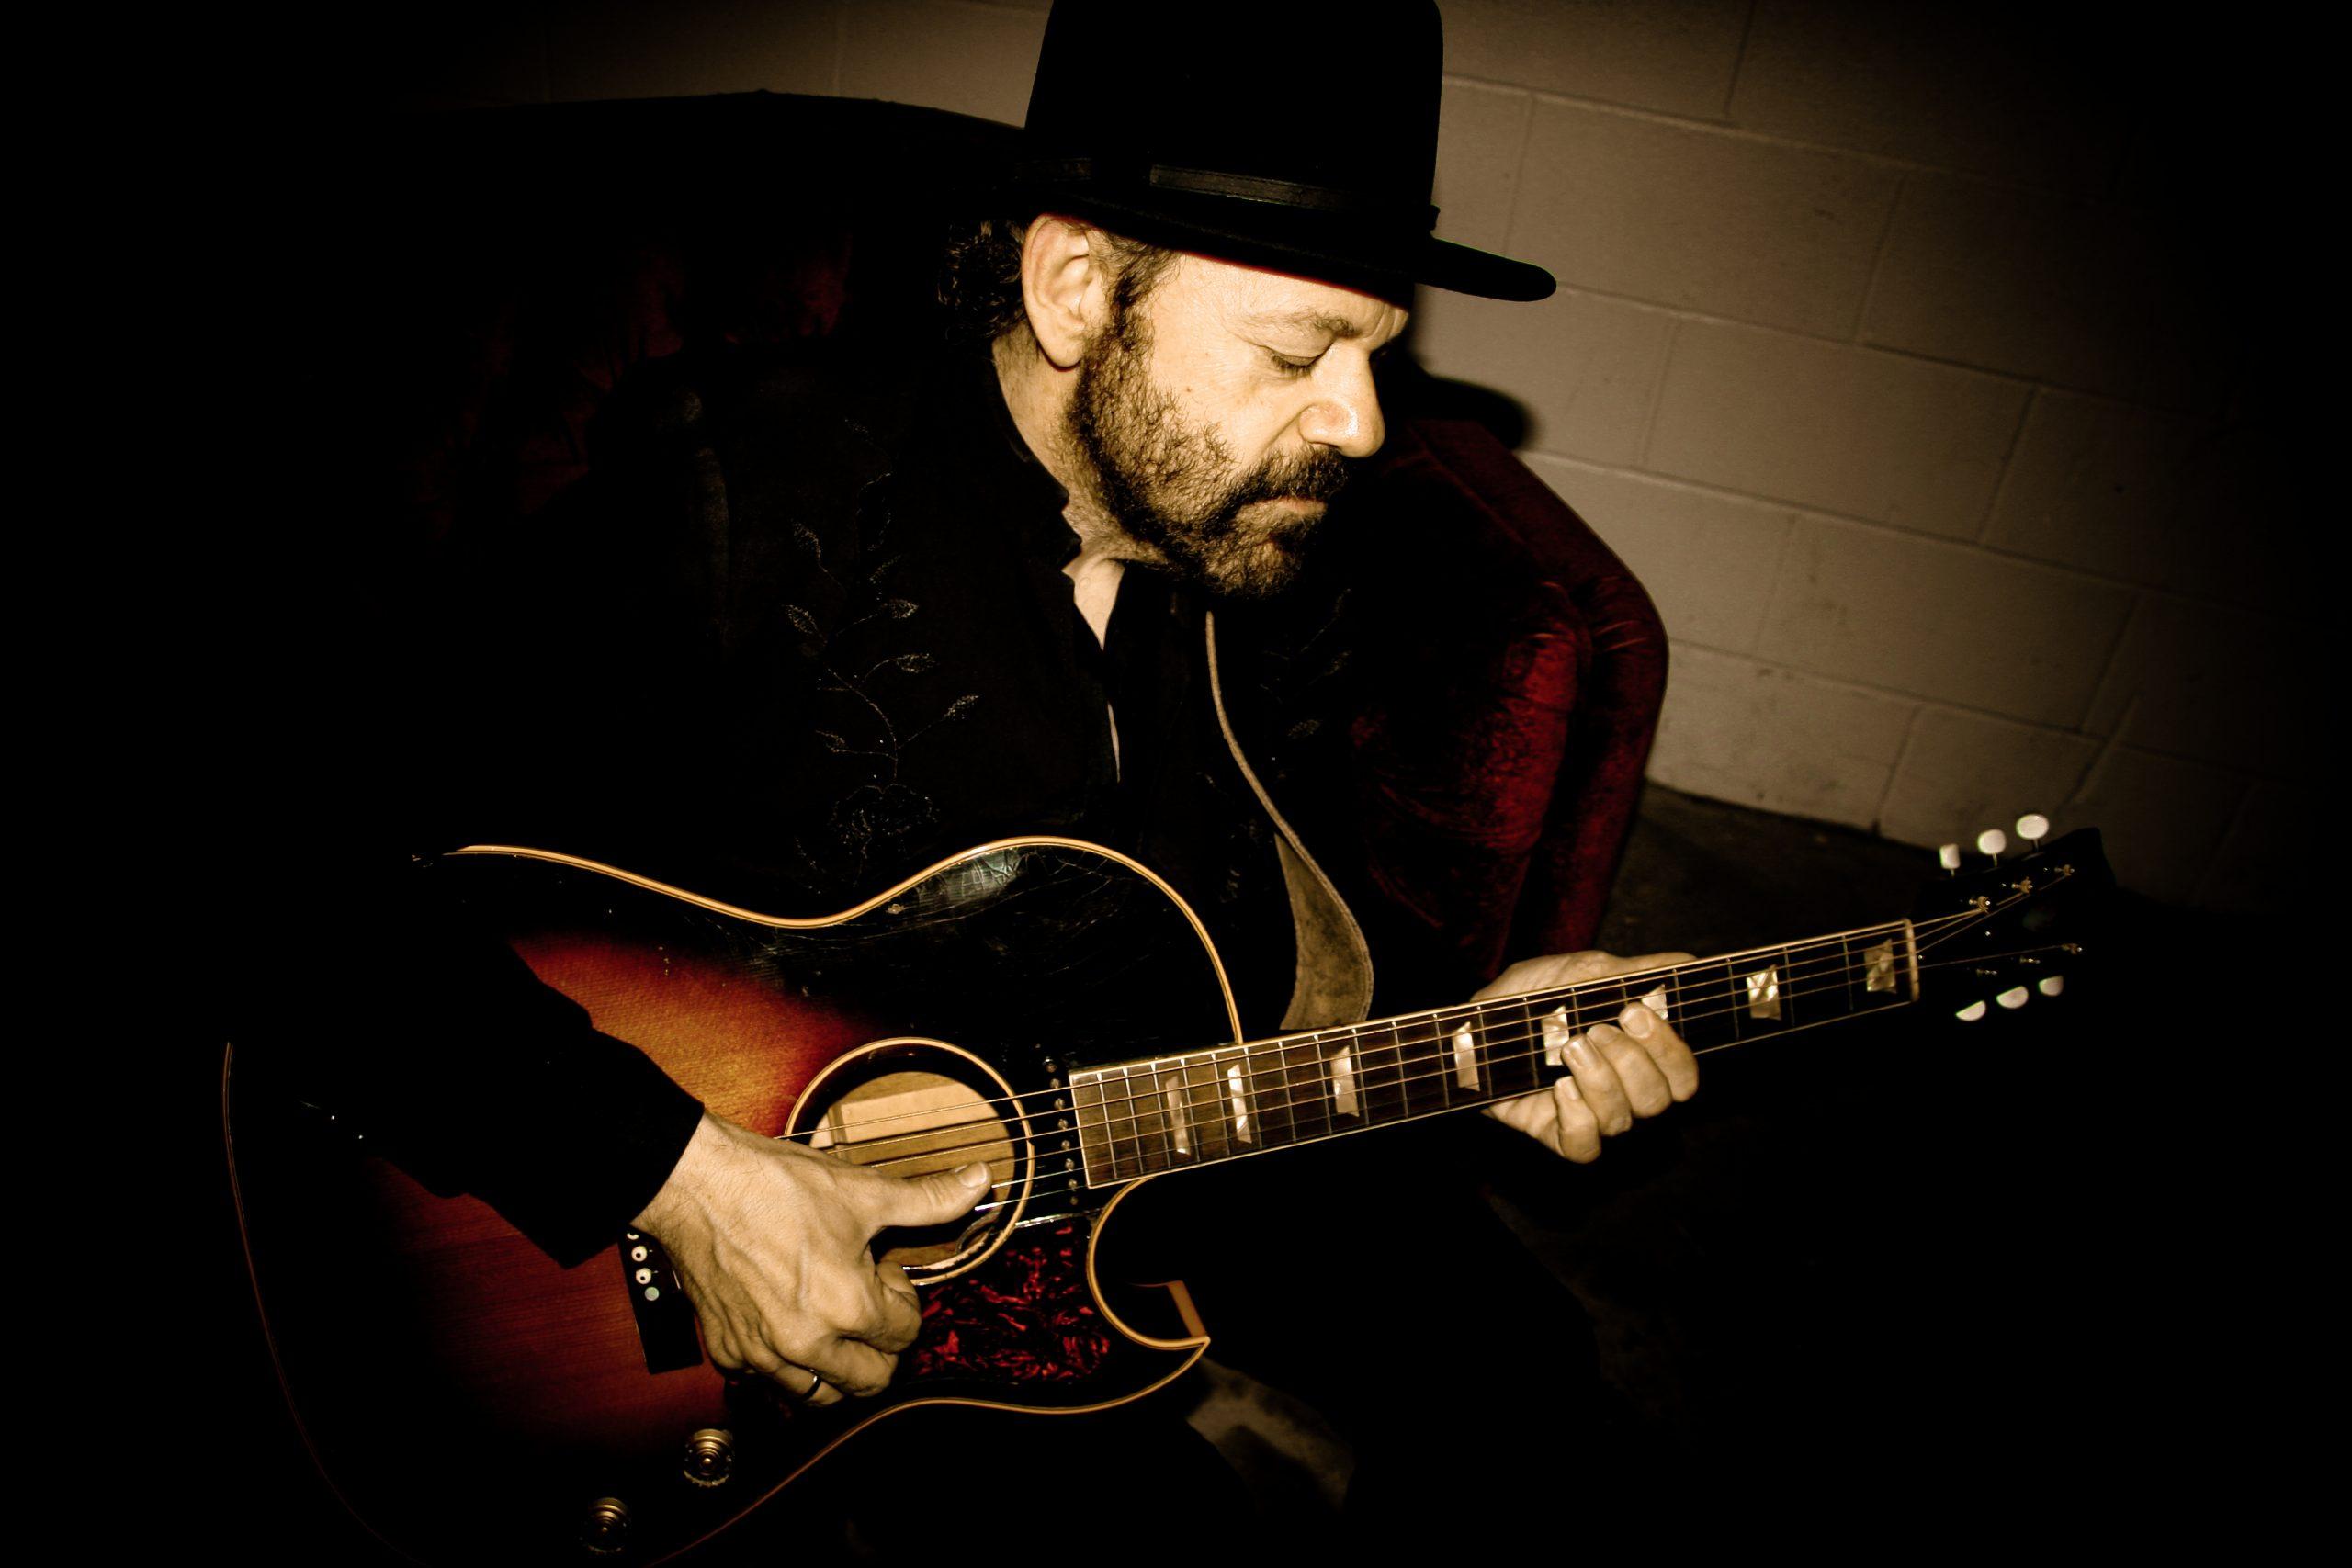 The String - Colin Linden